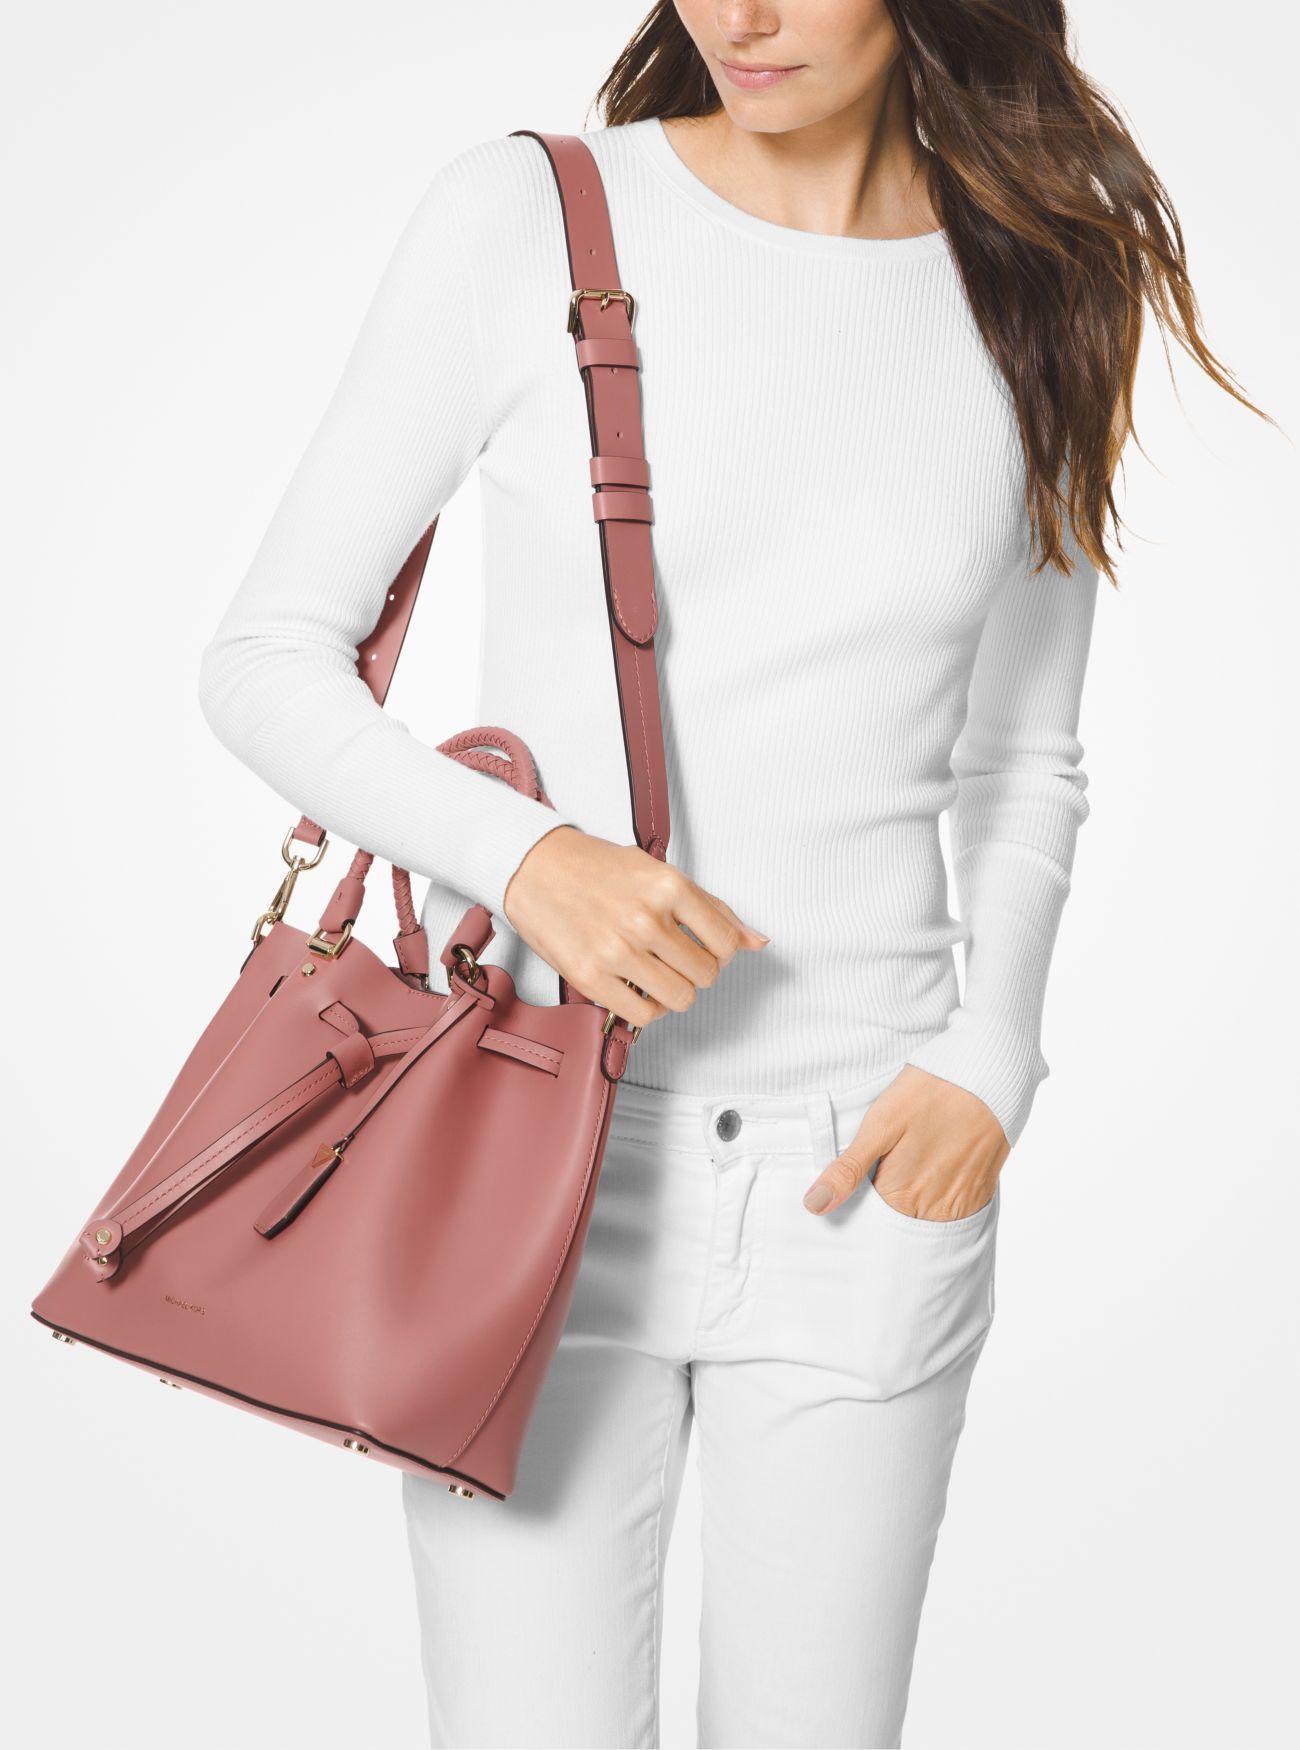 7592b9ff84 ... Blakely Medium Leather Bucket Bag